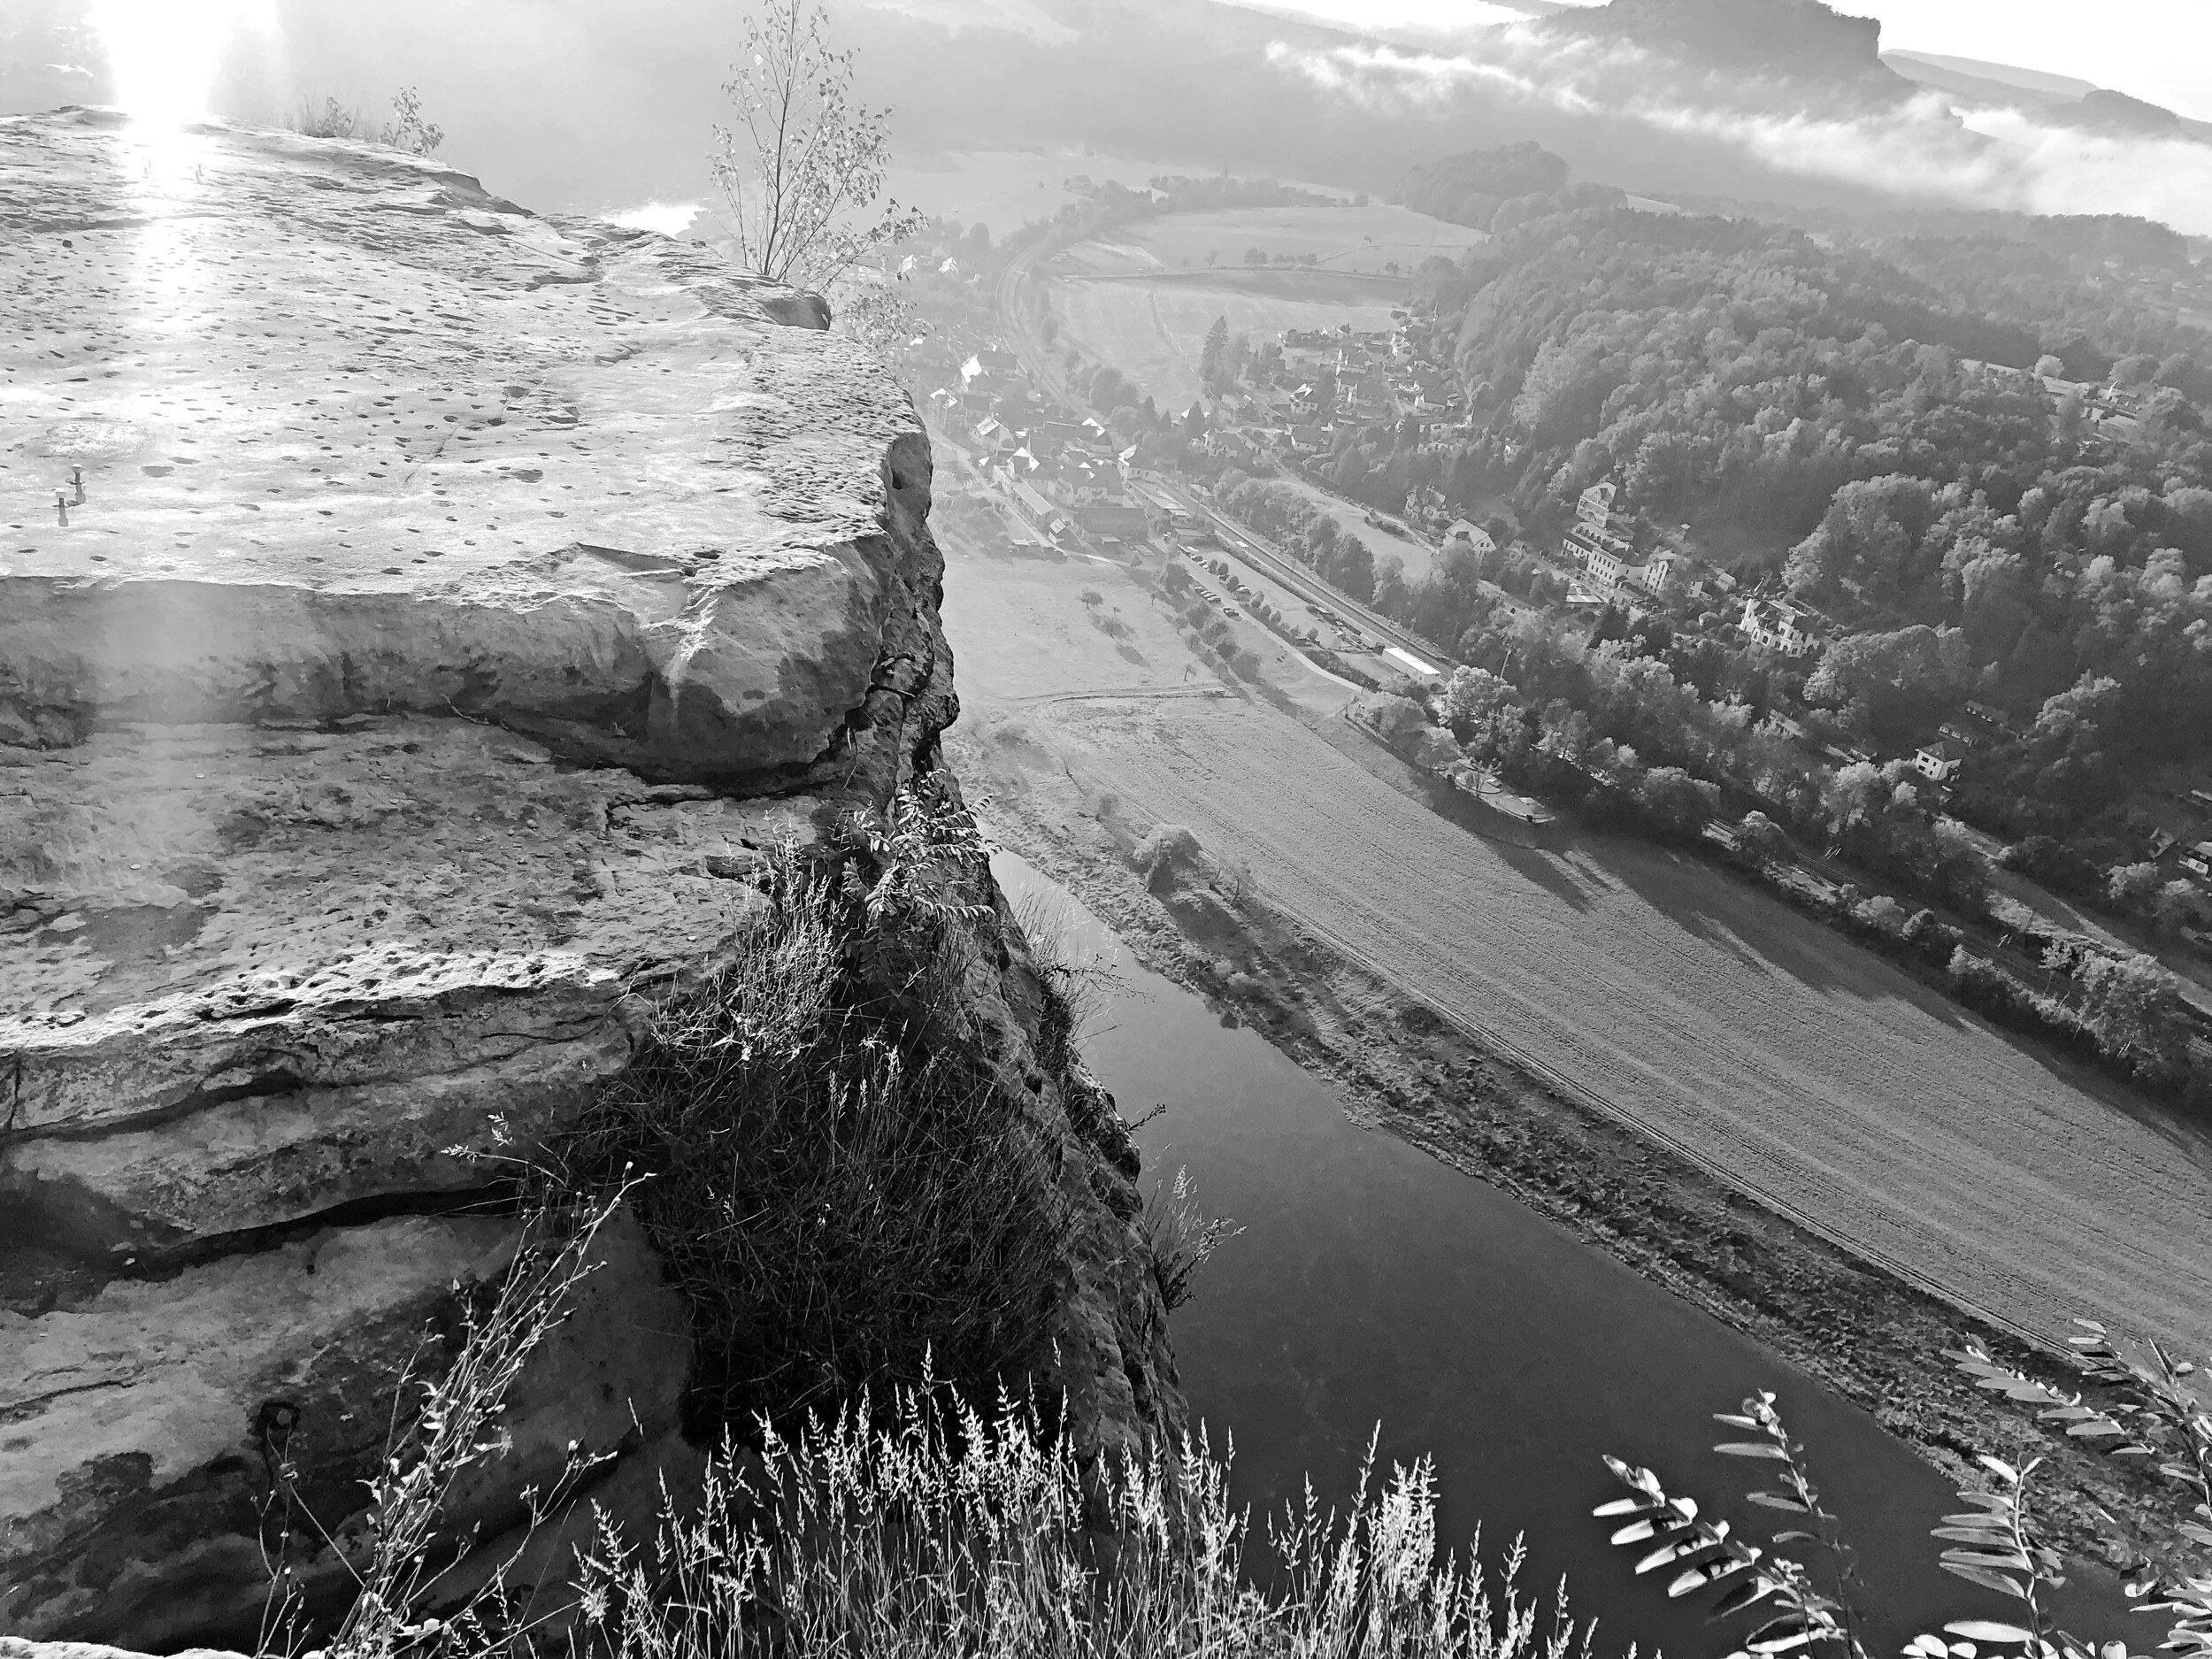 baste-bridge-lohmen-germany-hiking_0331.JPG